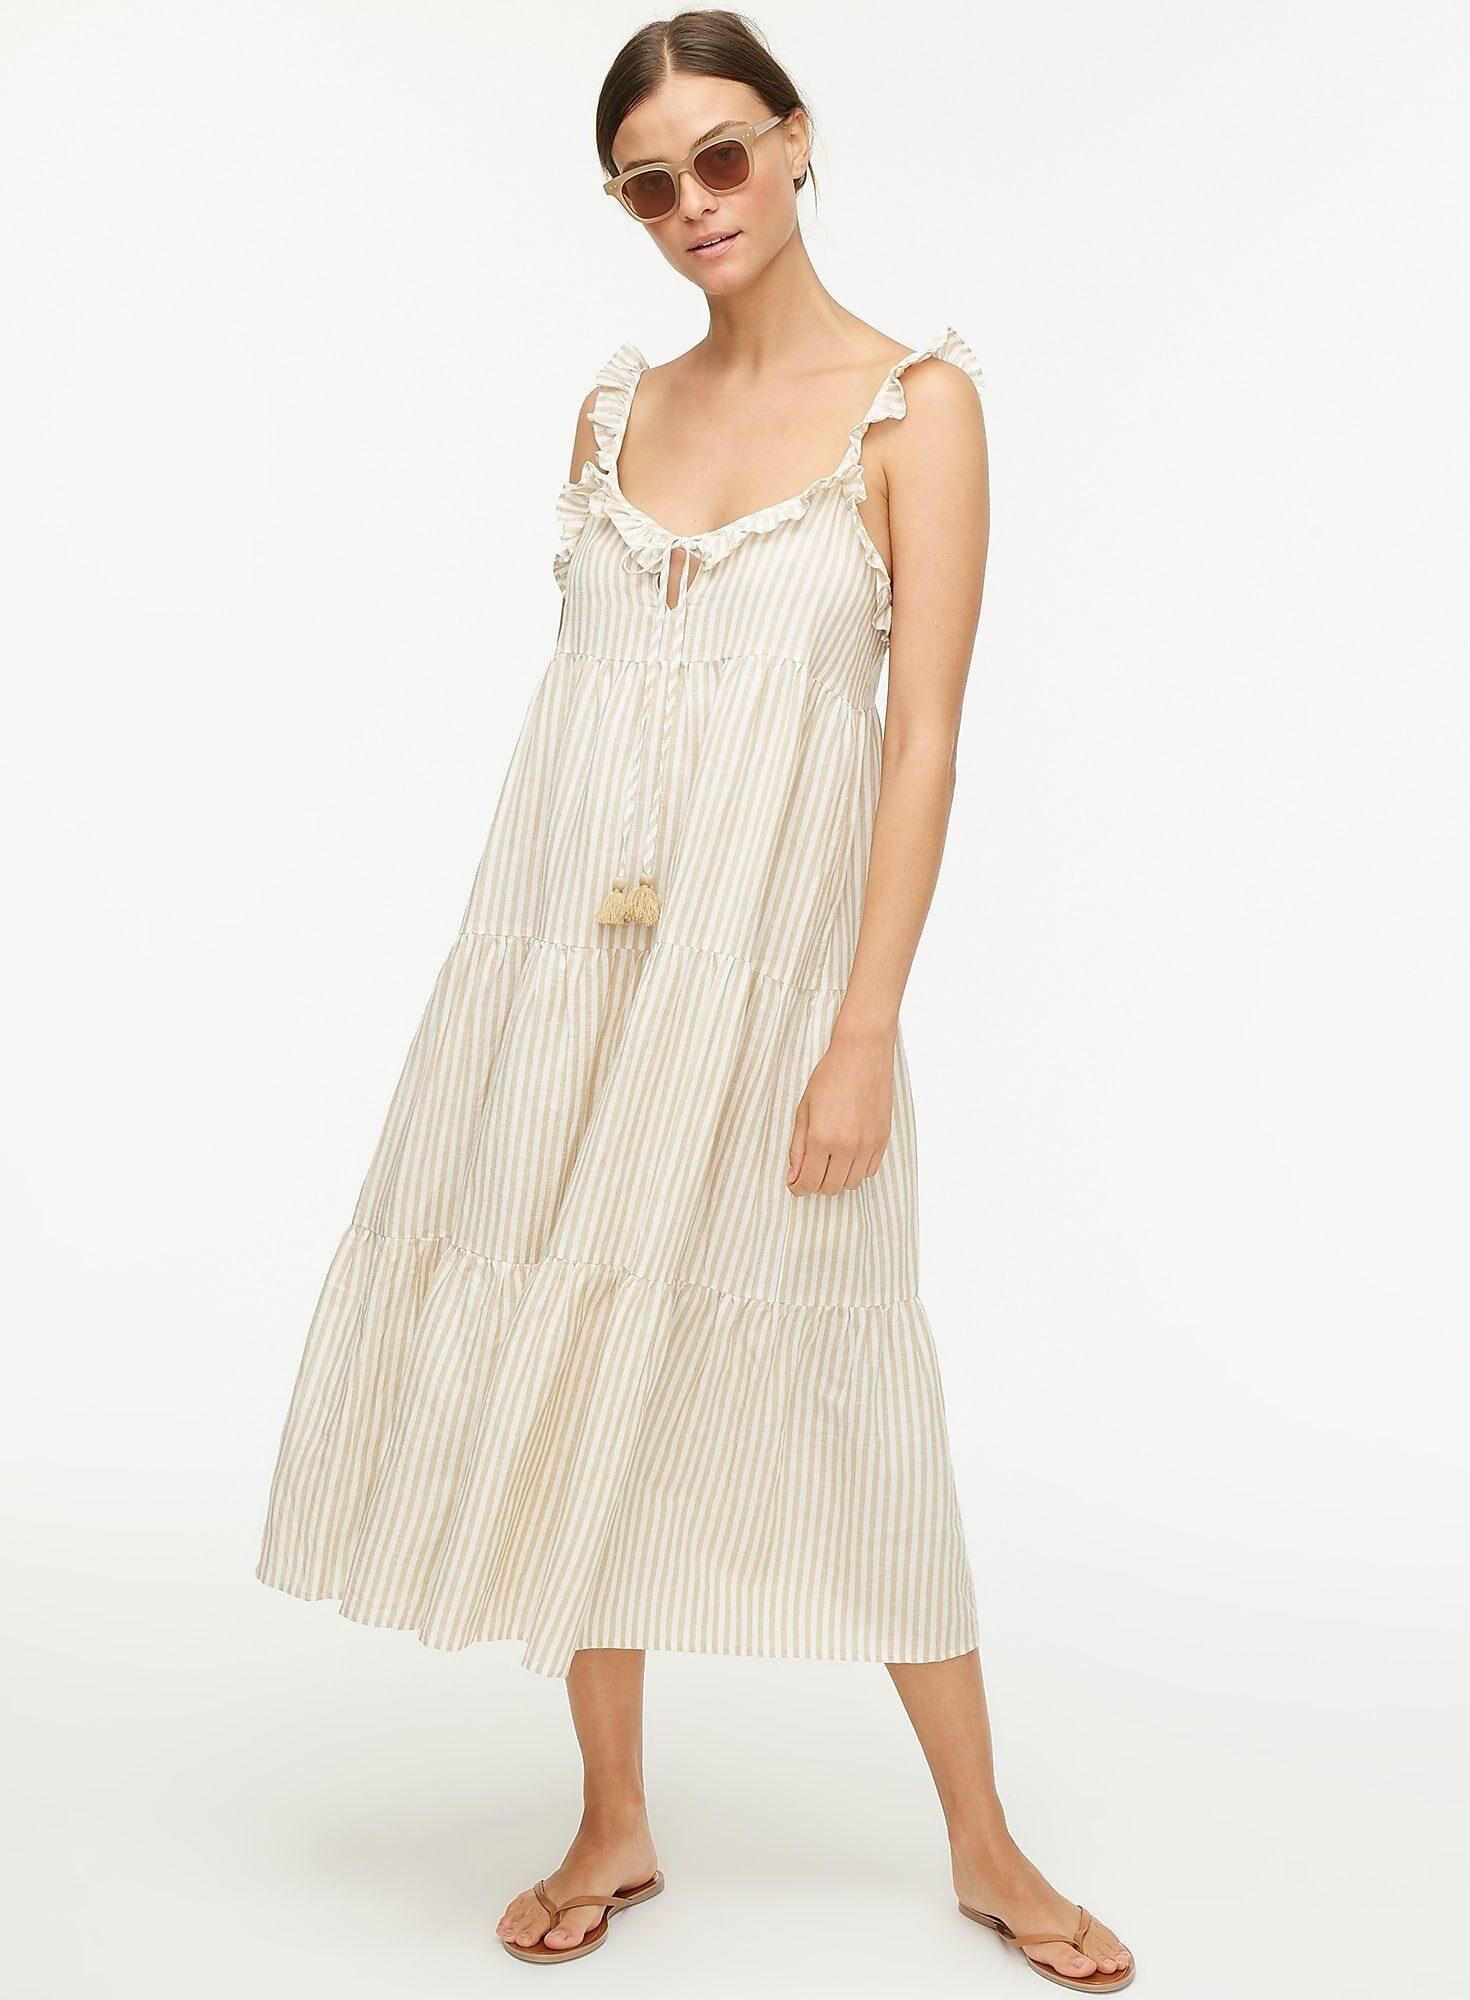 J.Crew Cotton Linen Tiered Maxi Dress